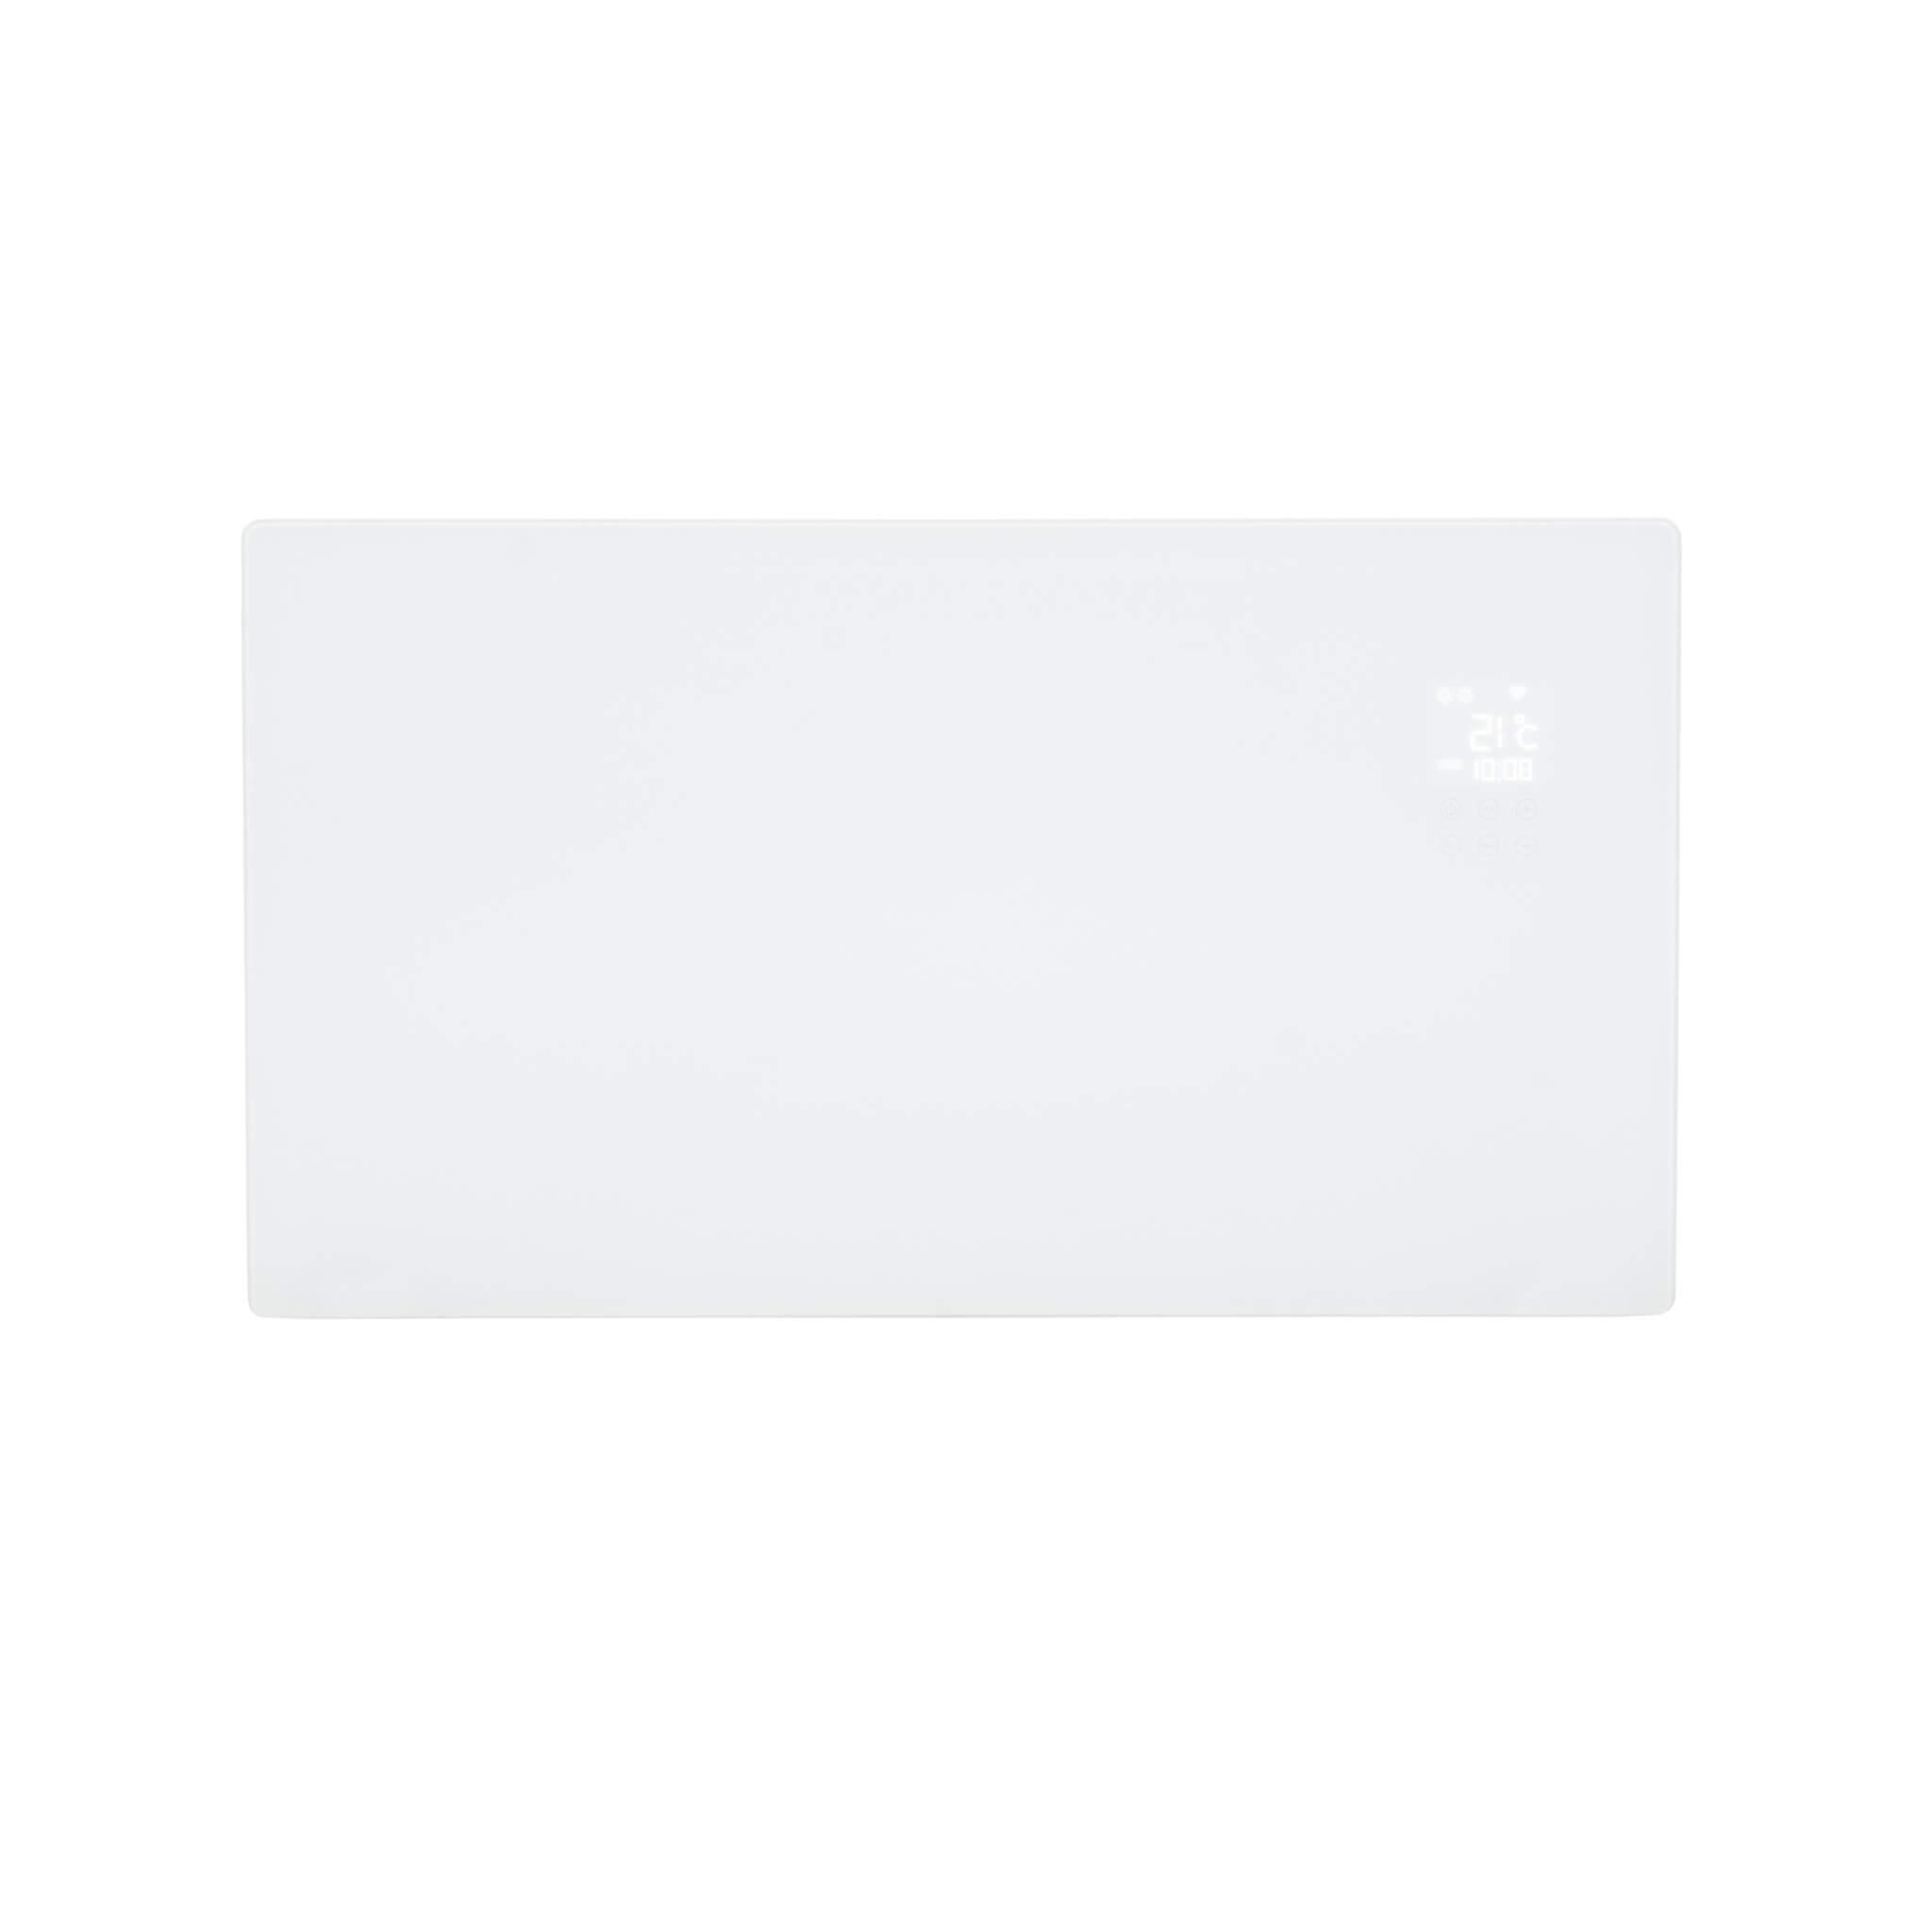 Eurom Alutherm Verre 1500 WiFi Convectorkachel | Moderne Kachel met LED Display (verwarming elektrisch)